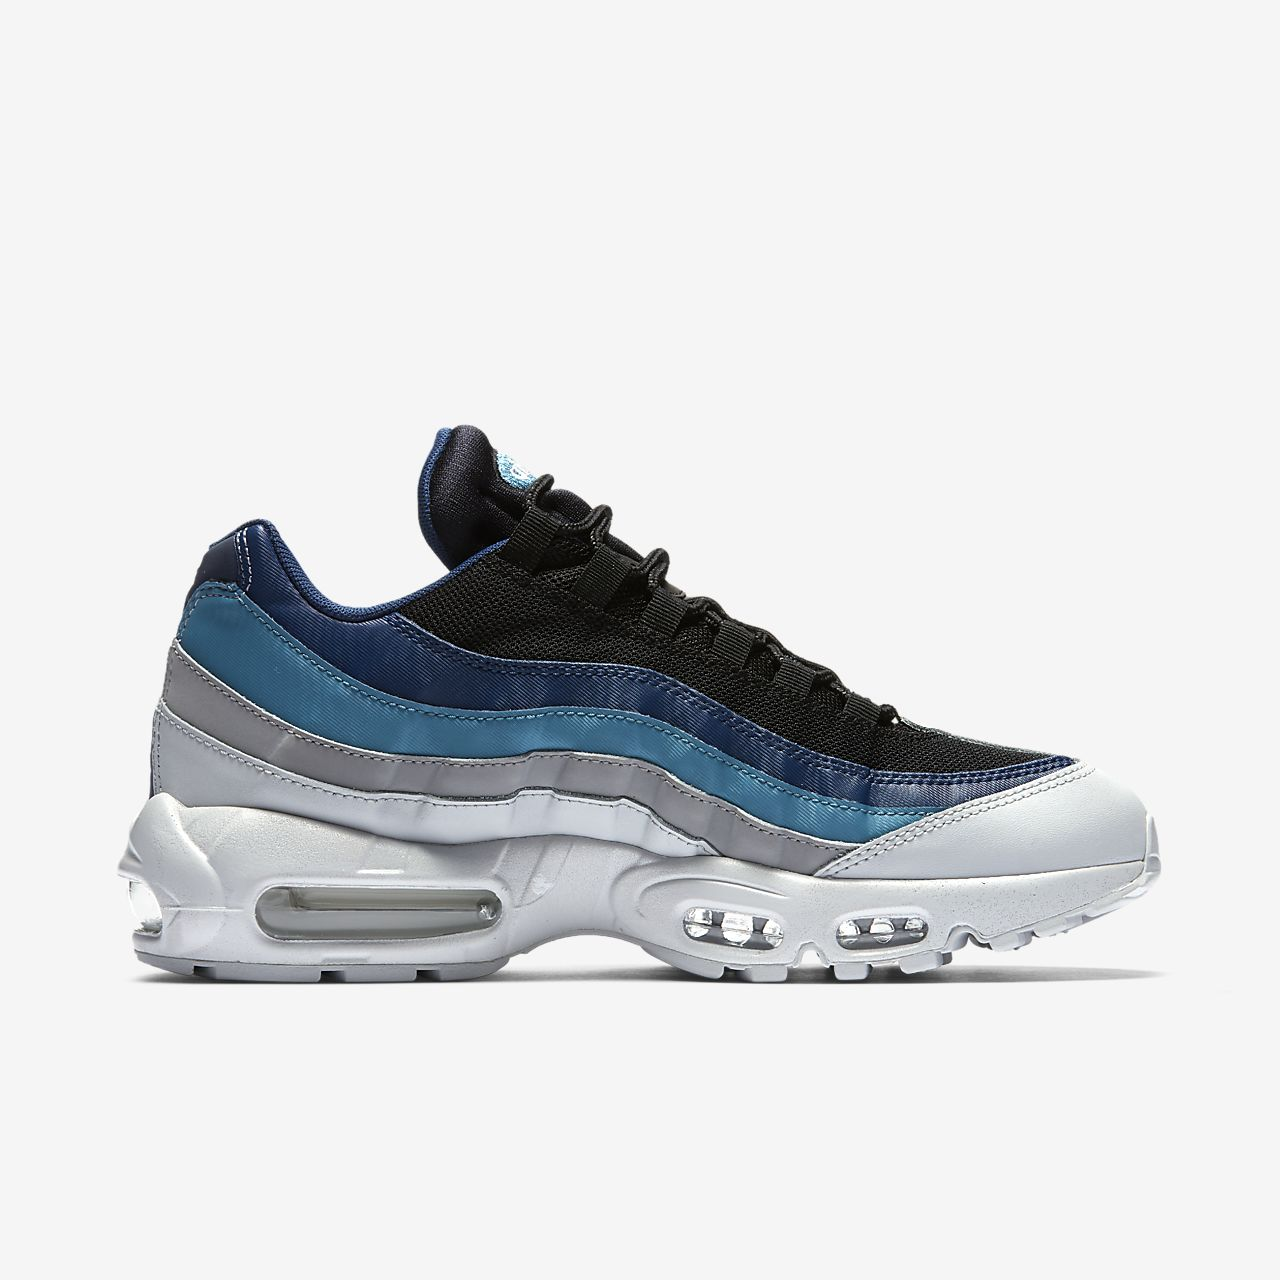 ... Nike Air Max 95 Essential-sko til mænd